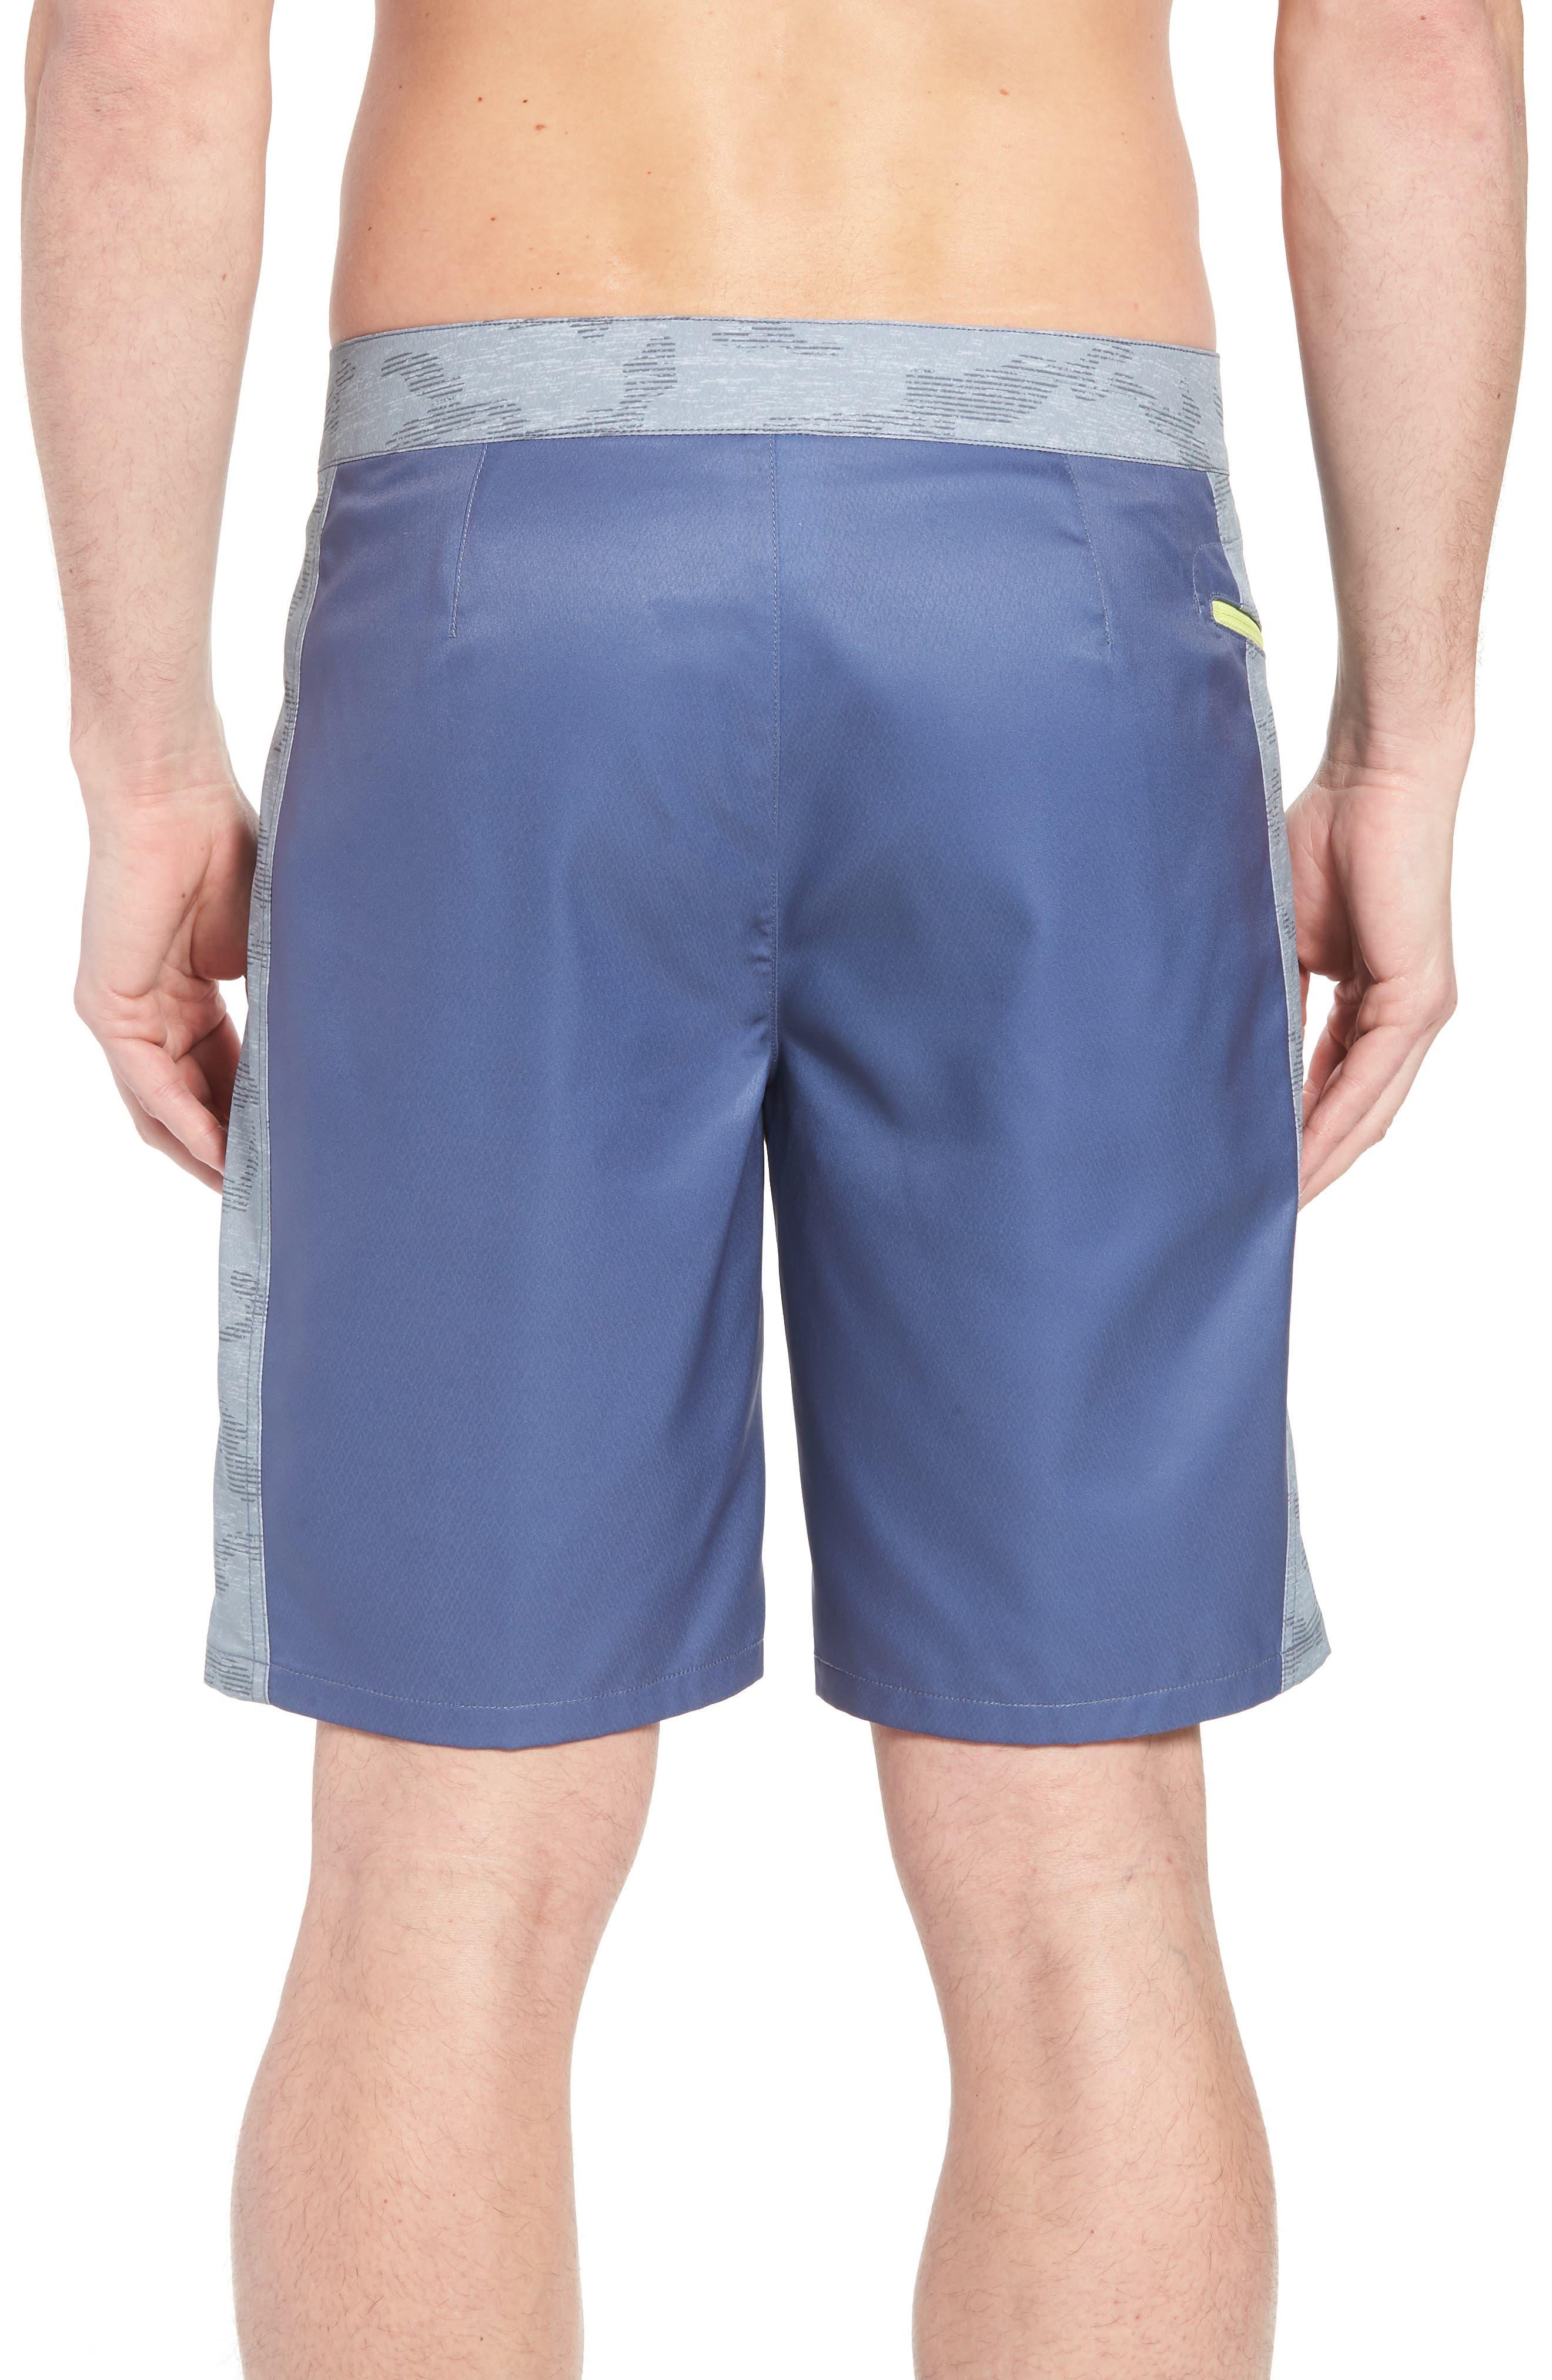 Camo Board Shorts,                             Alternate thumbnail 2, color,                             068